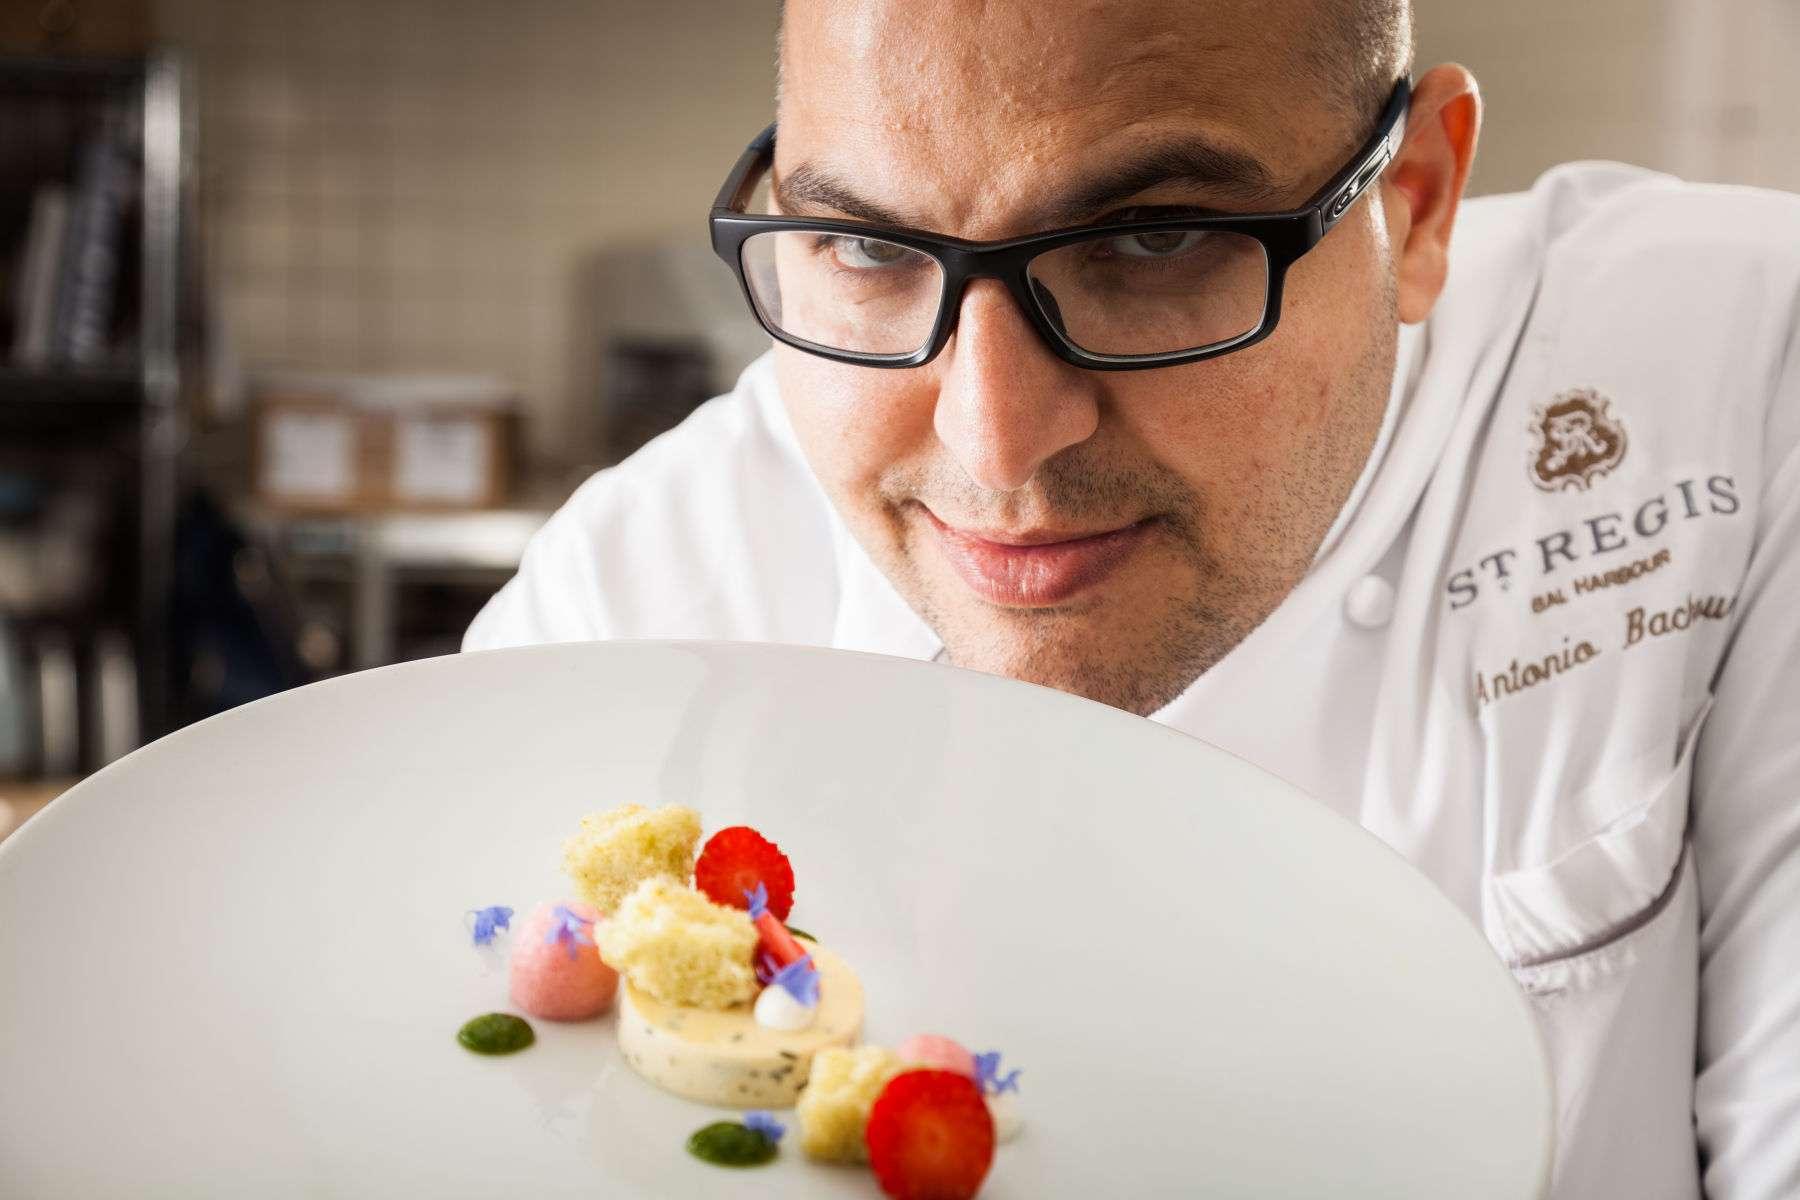 Pastry Chef Antonio Bachour